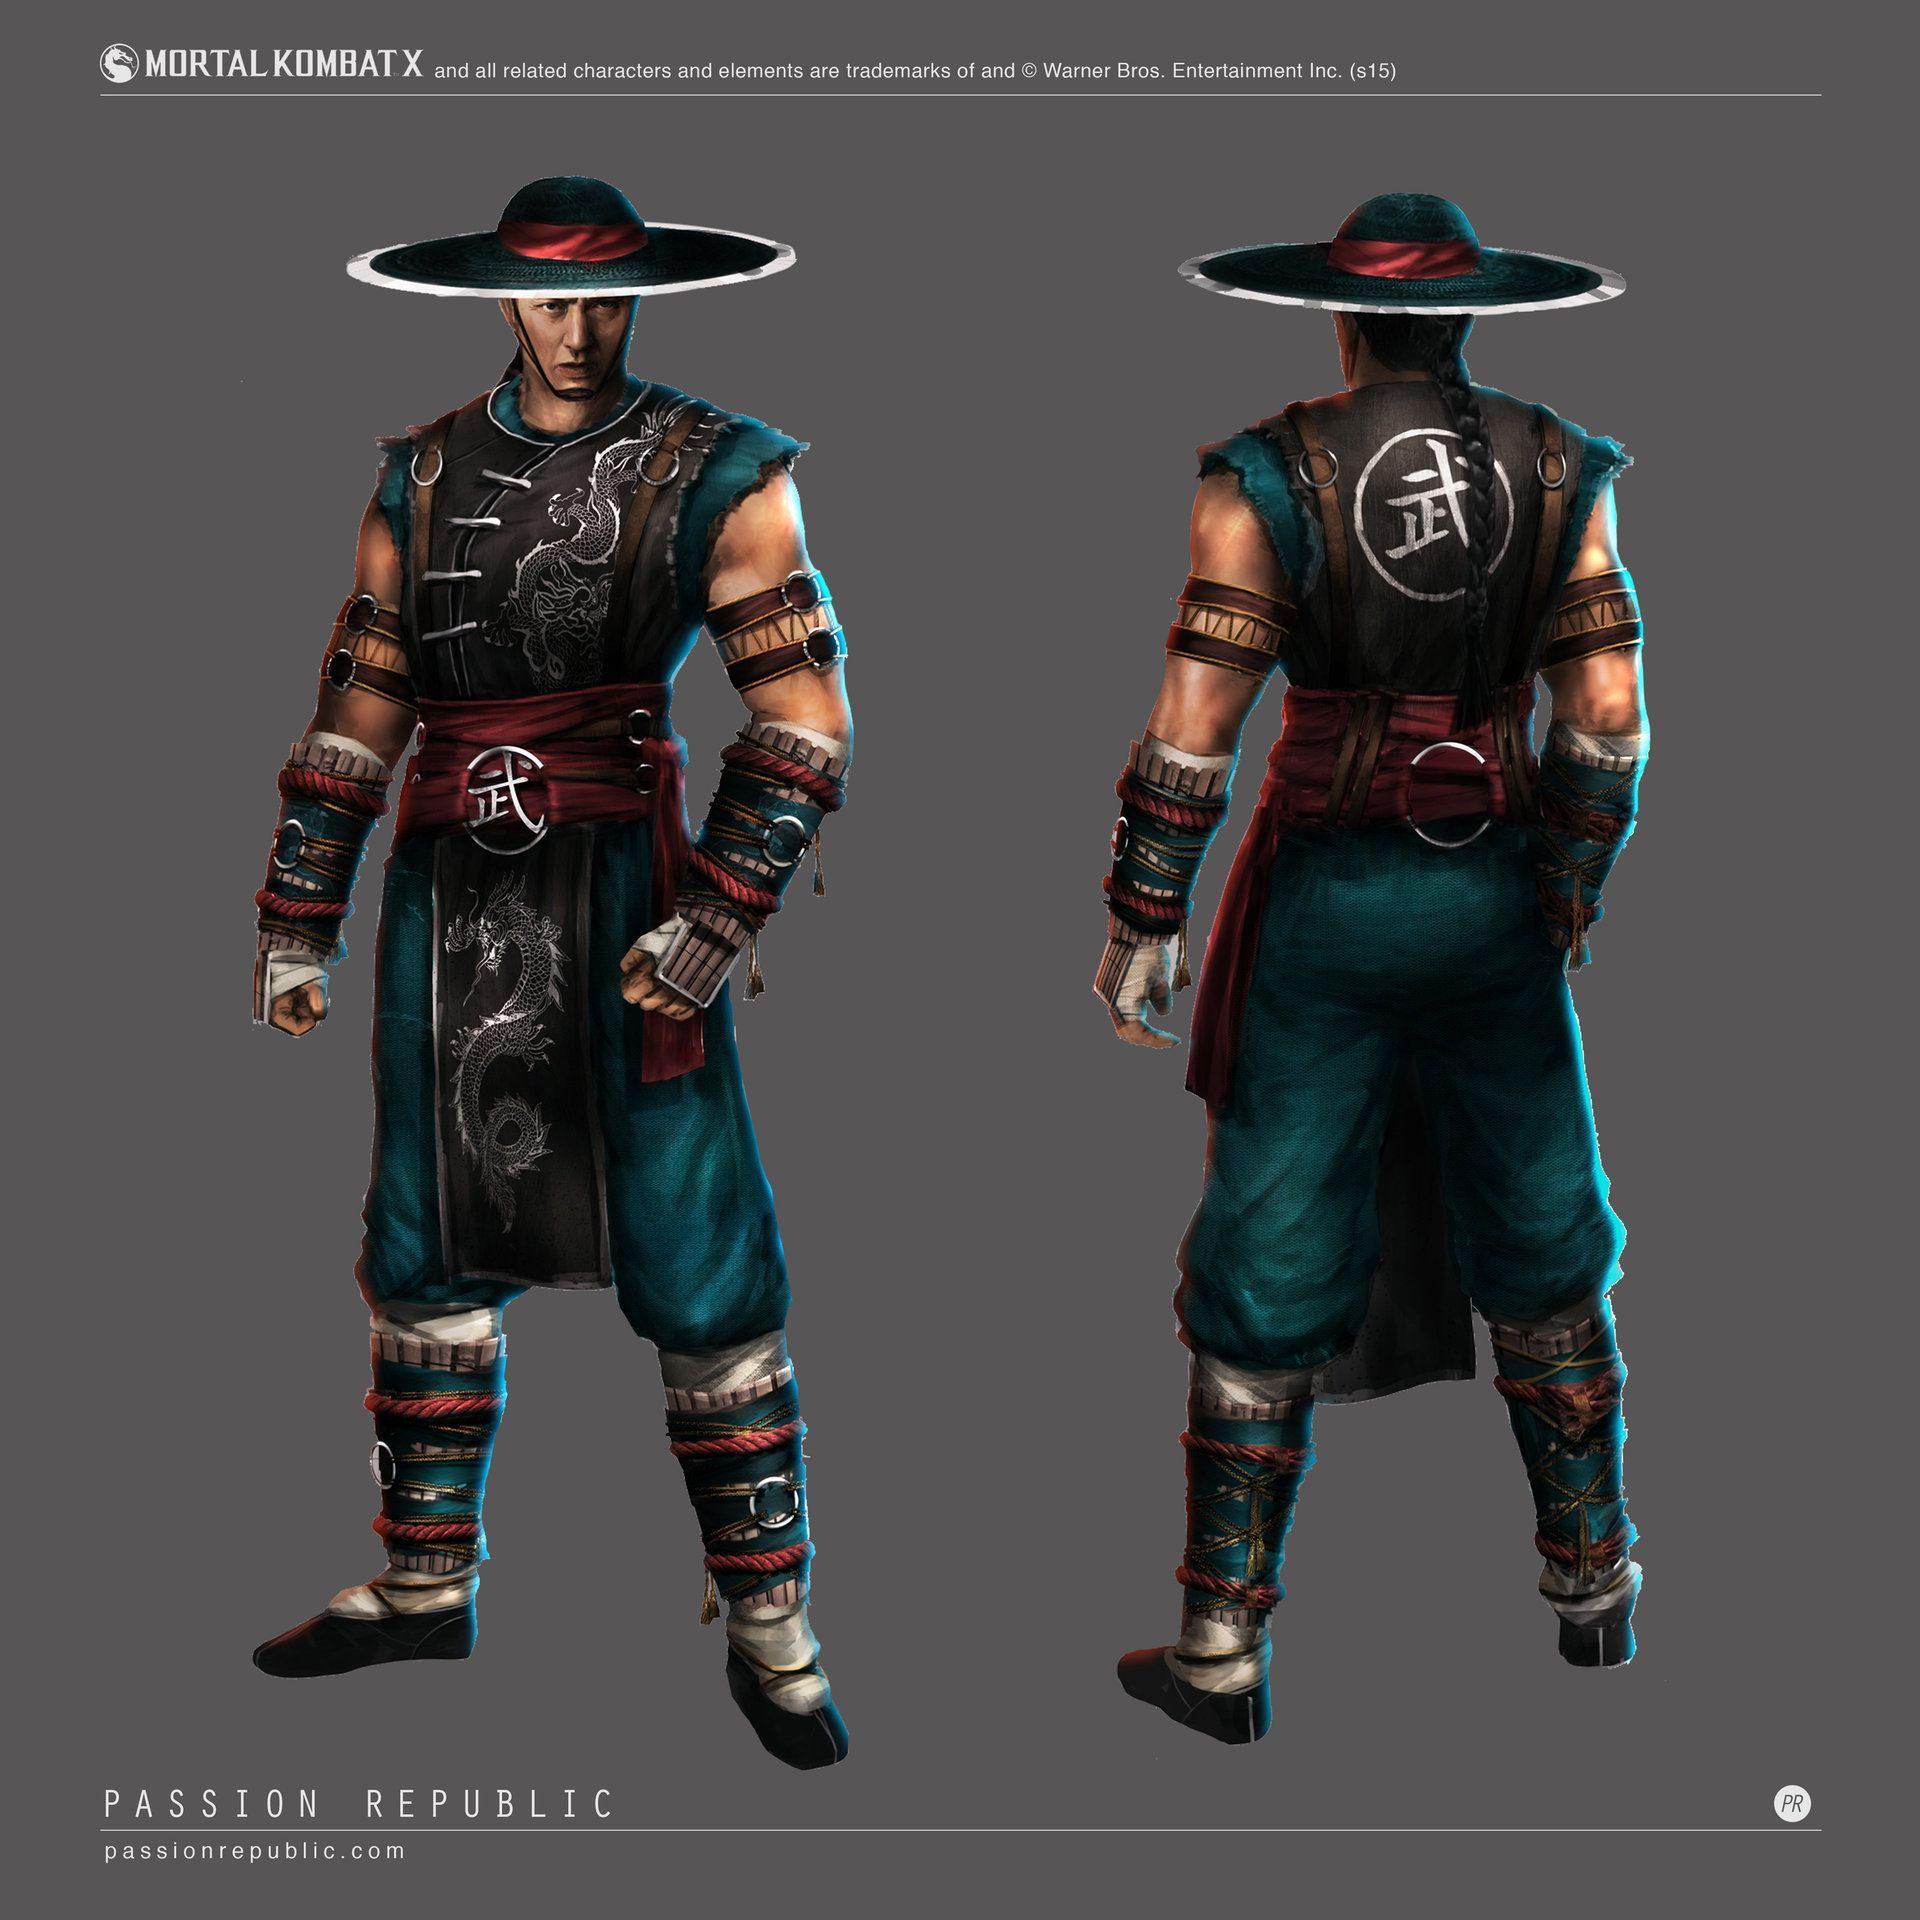 Kung Lao Mortal Kombat X Mortal Kombat Mortal Kombat Characters